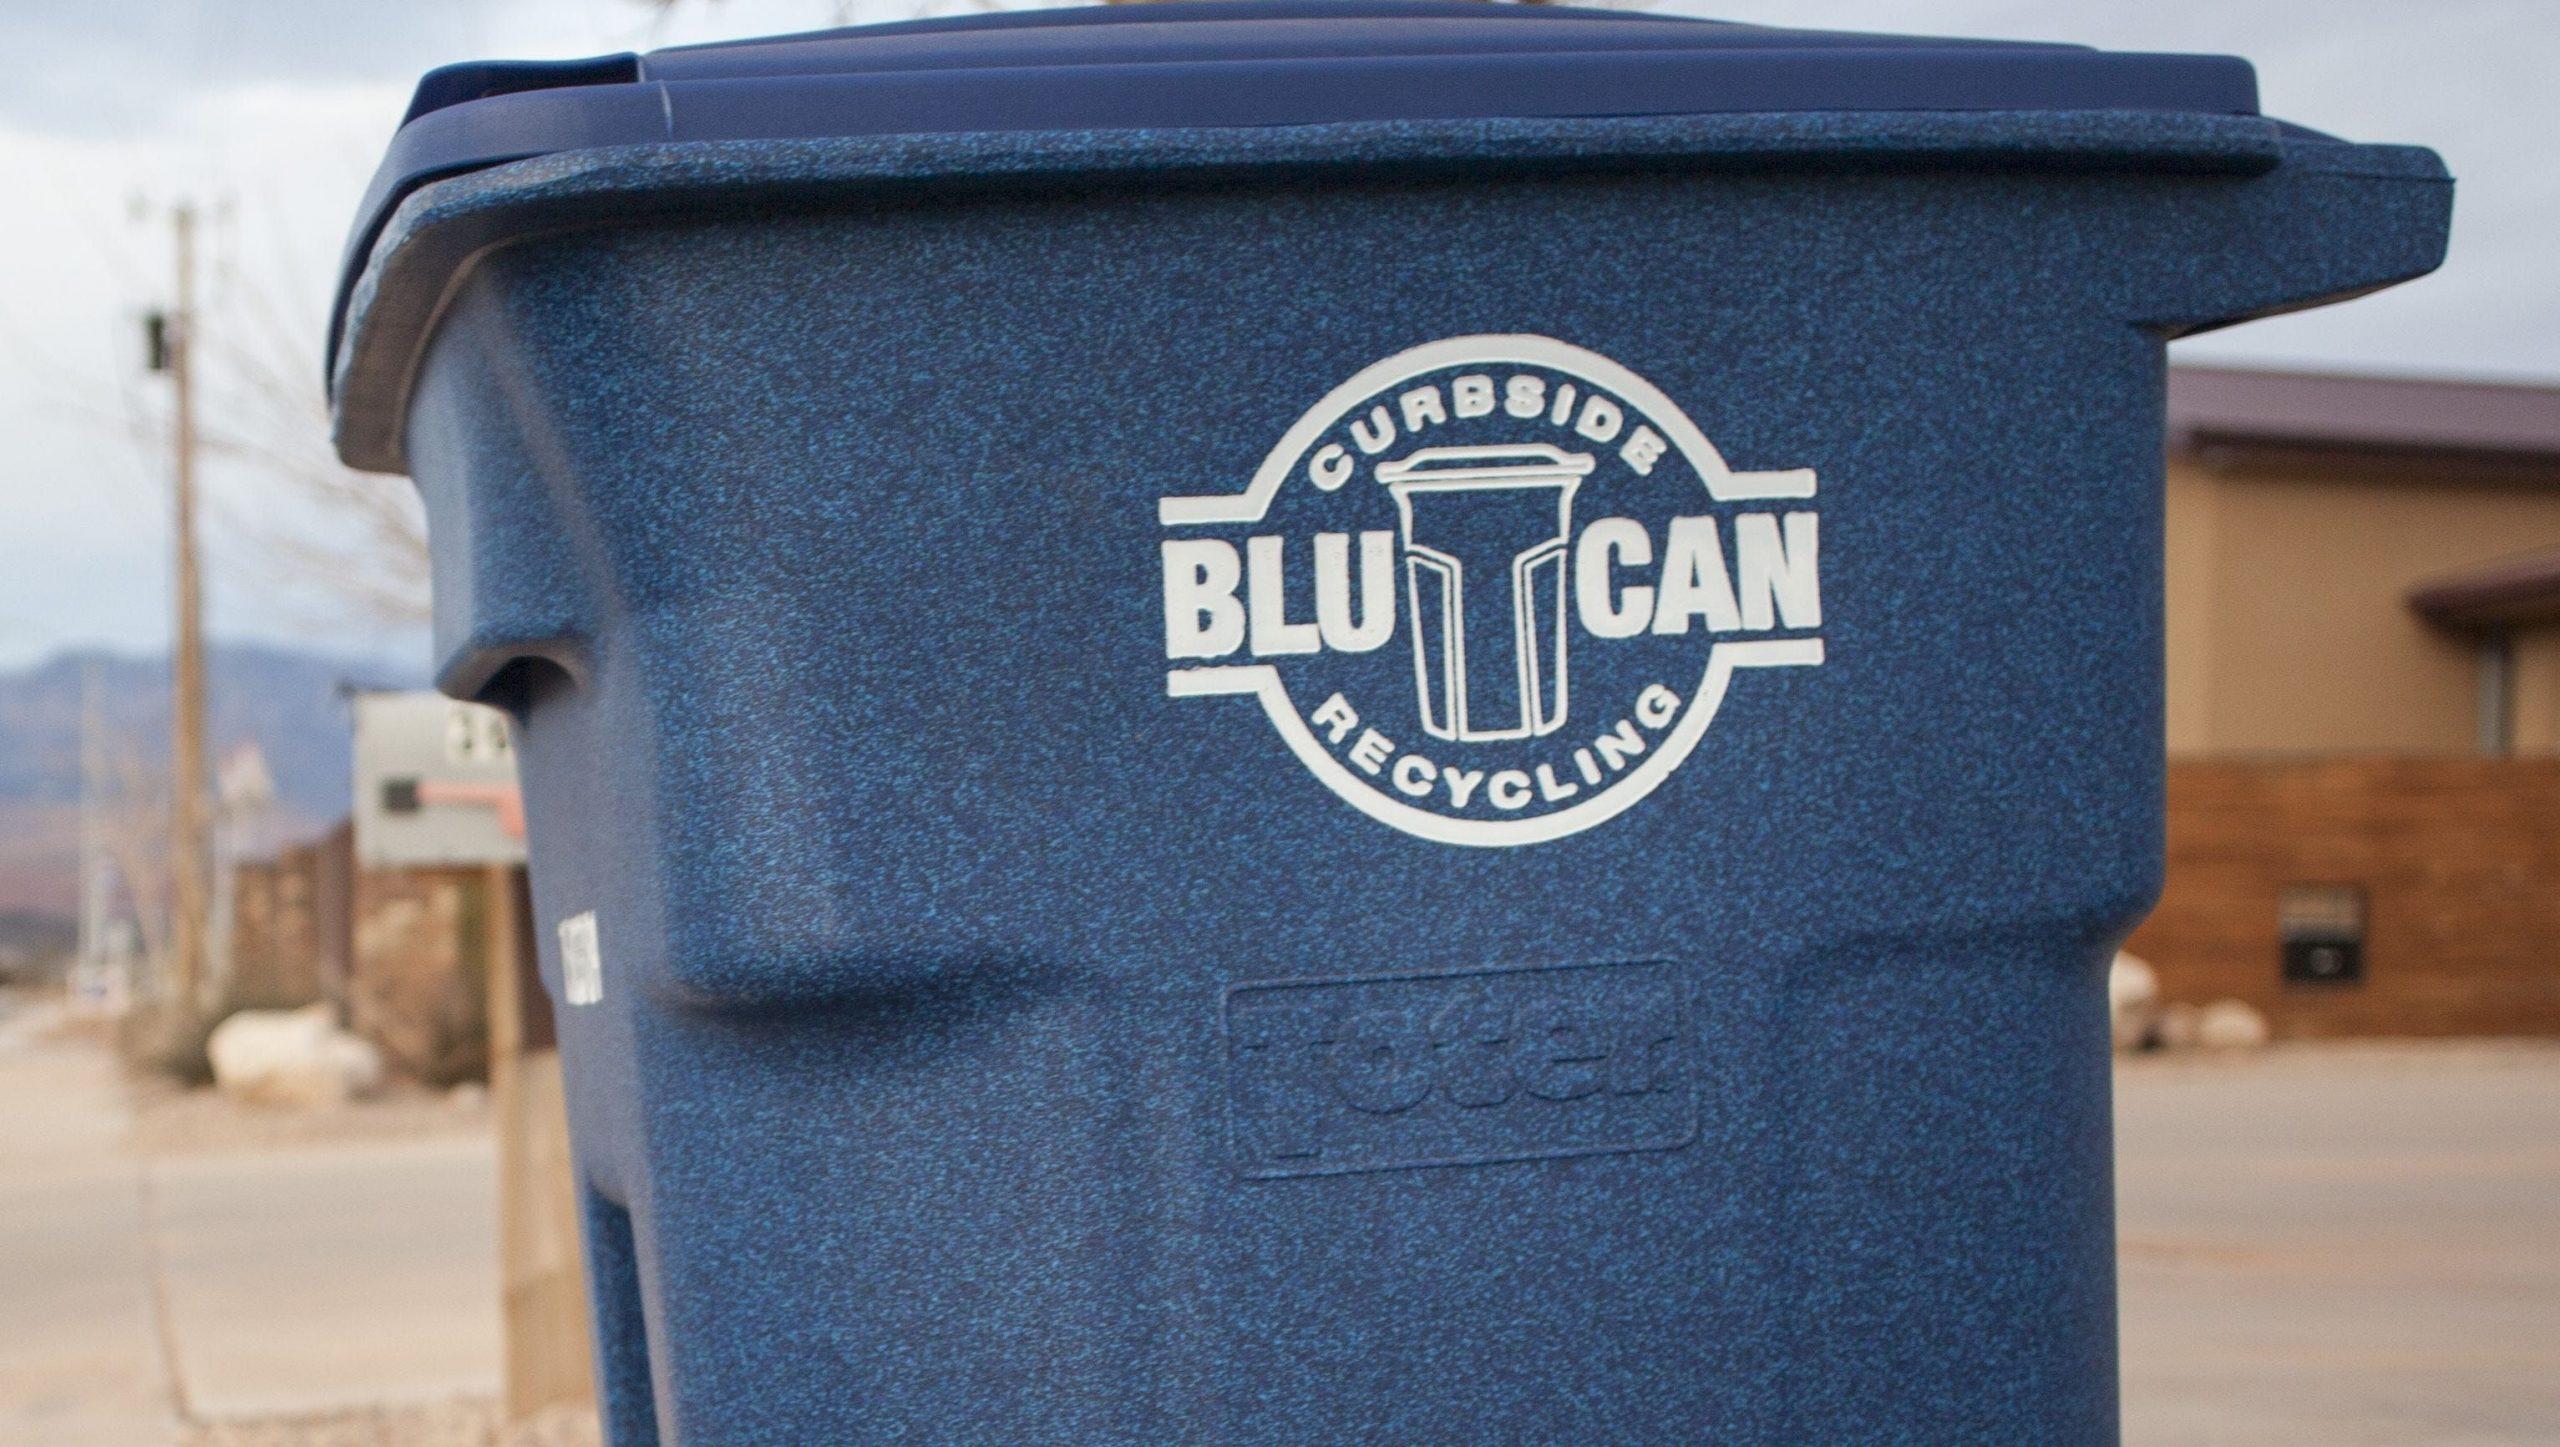 Is Washington County Recycling?